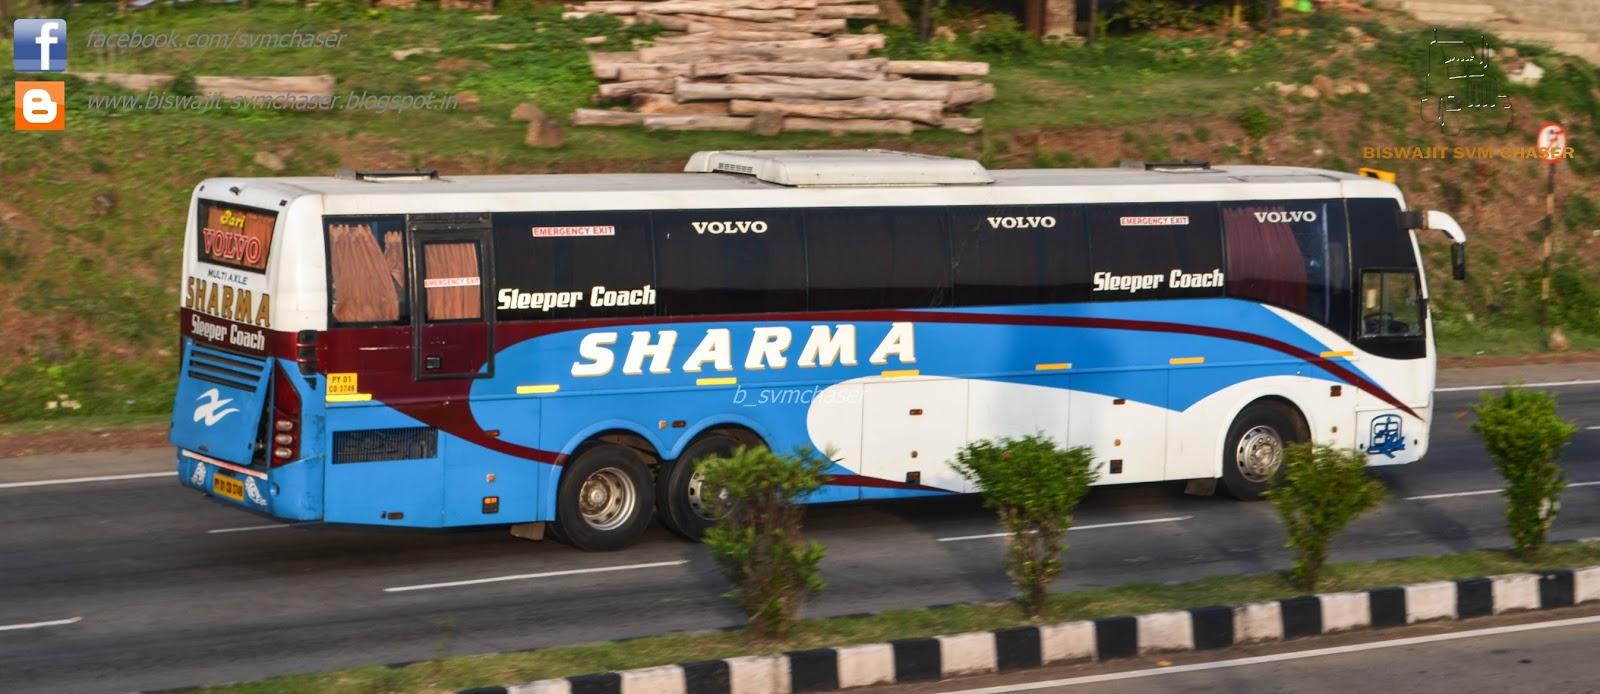 Sharma Transports VOLVO B9R Multiaxle Sleeper PY01 CD 3749 | Biswajit SVM Chaser